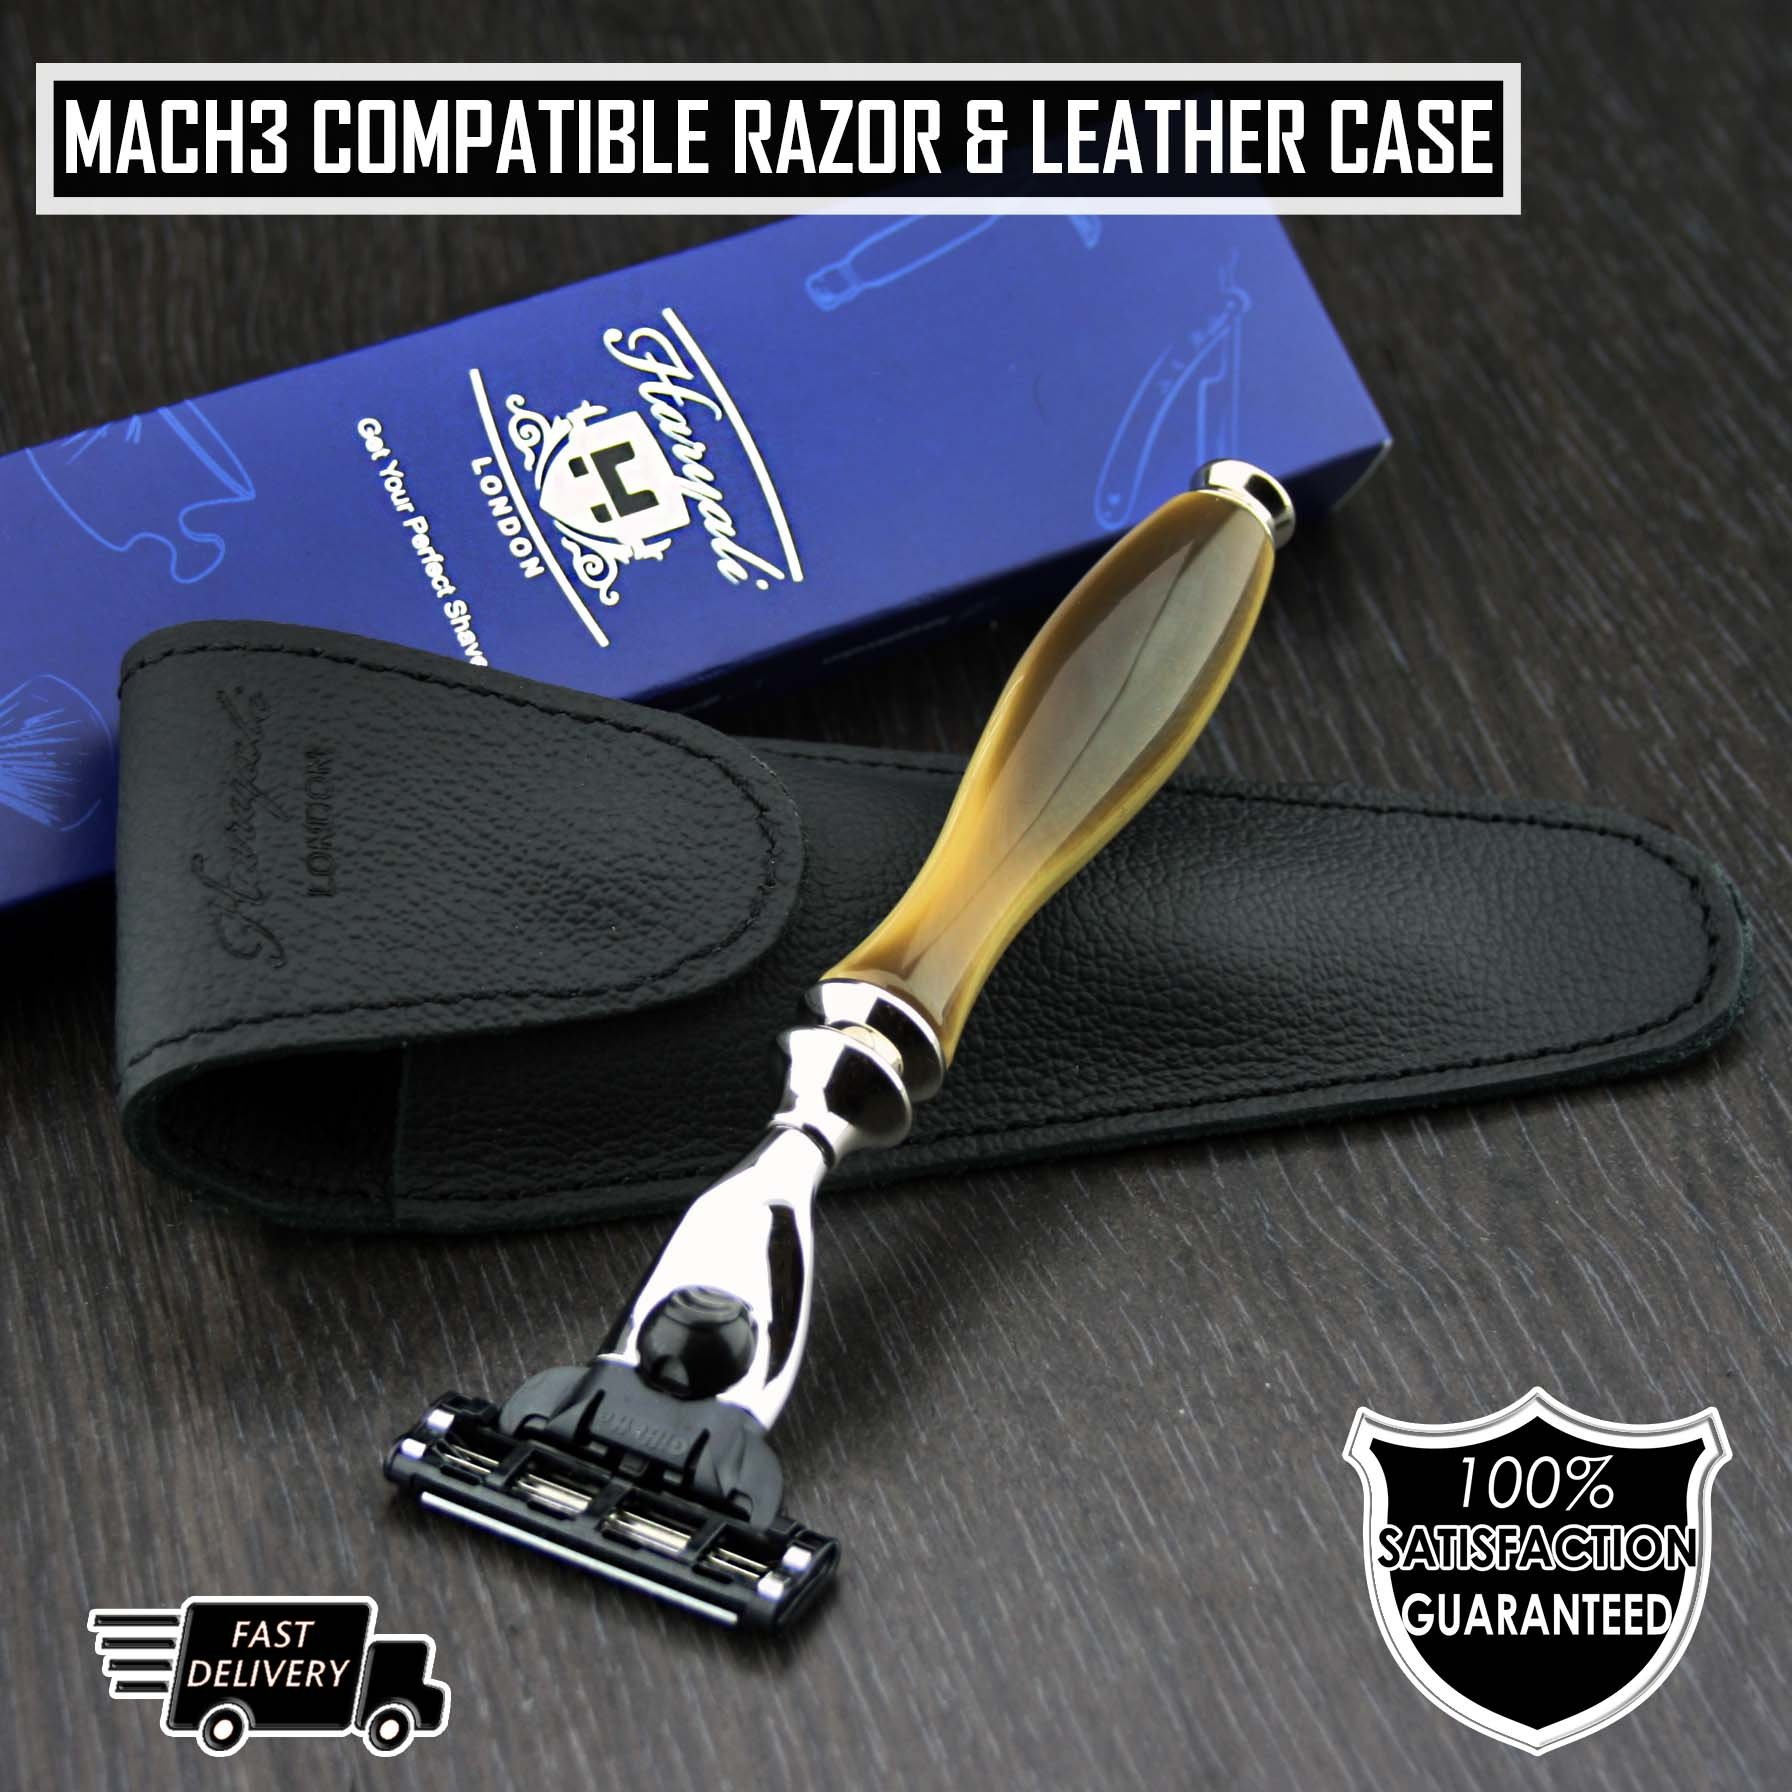 Men's Shaving Razor Gillette Mach3 Compatible Razor with Horn Replica Handle | Men's Shaving & Grooming Essentials | Gift for Him